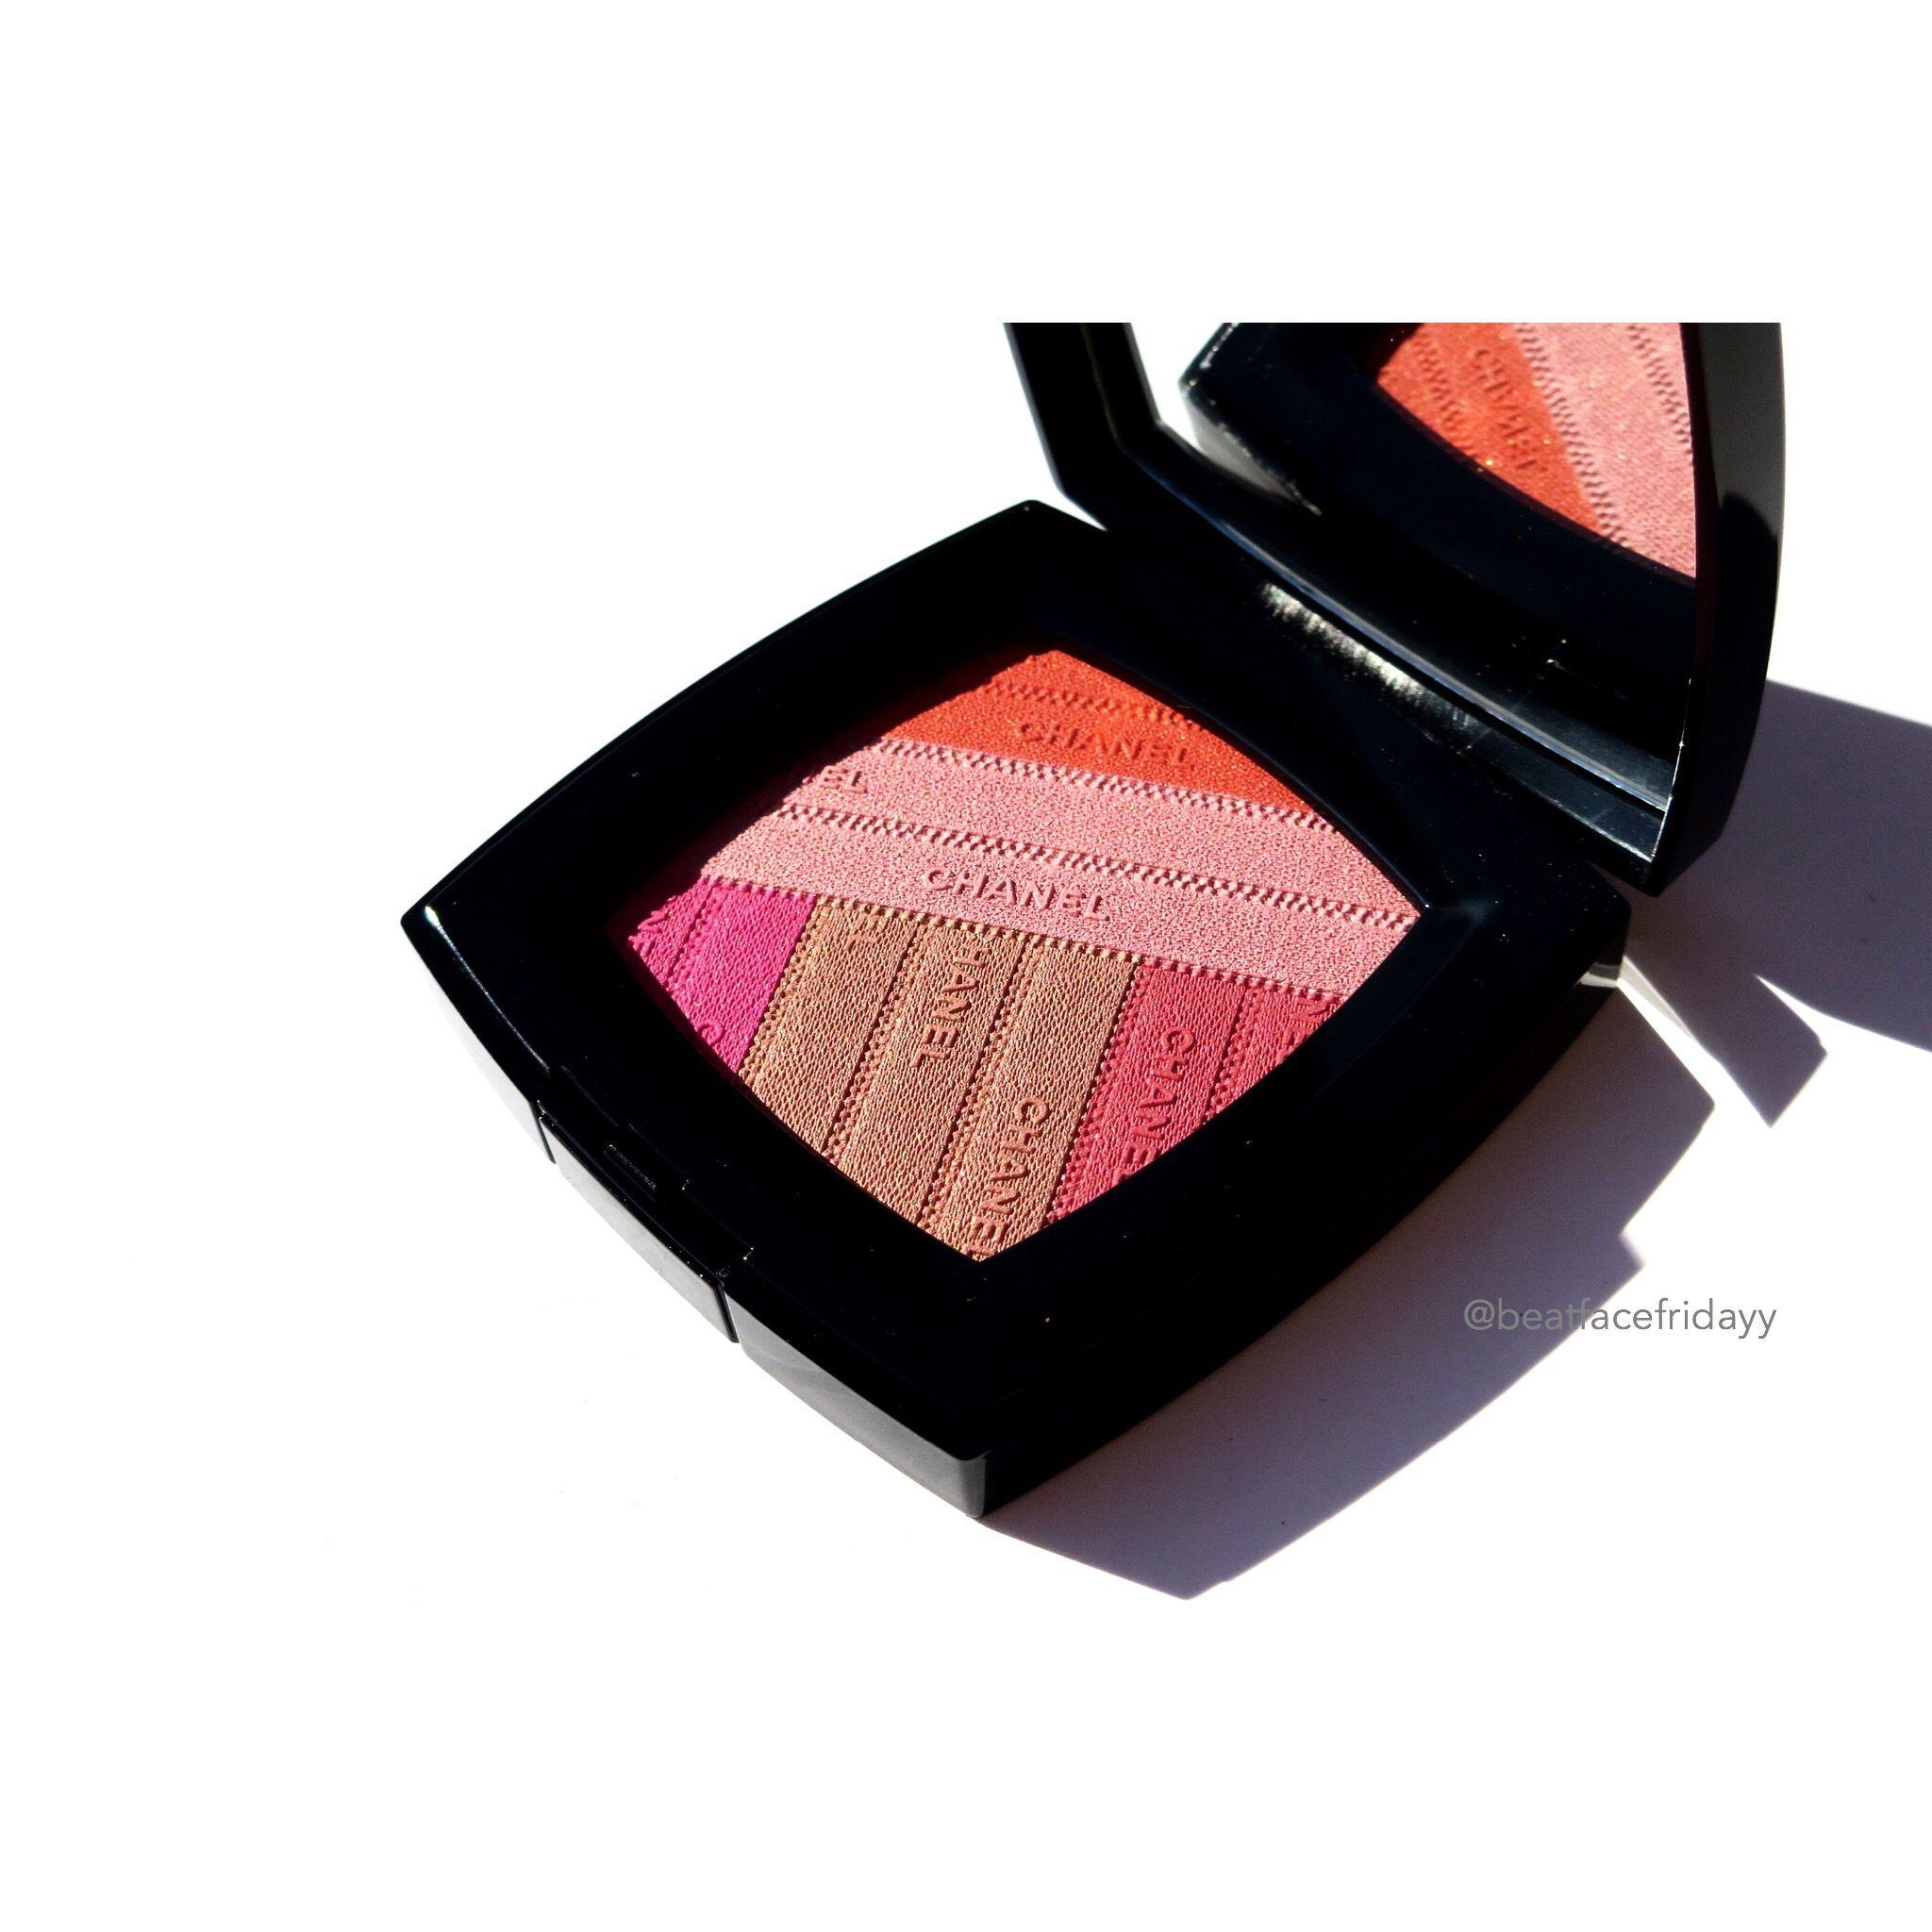 Chanel Sunkiss Ribbon Blush Spring 2016 Photos, Swatches – beatfacefridayy